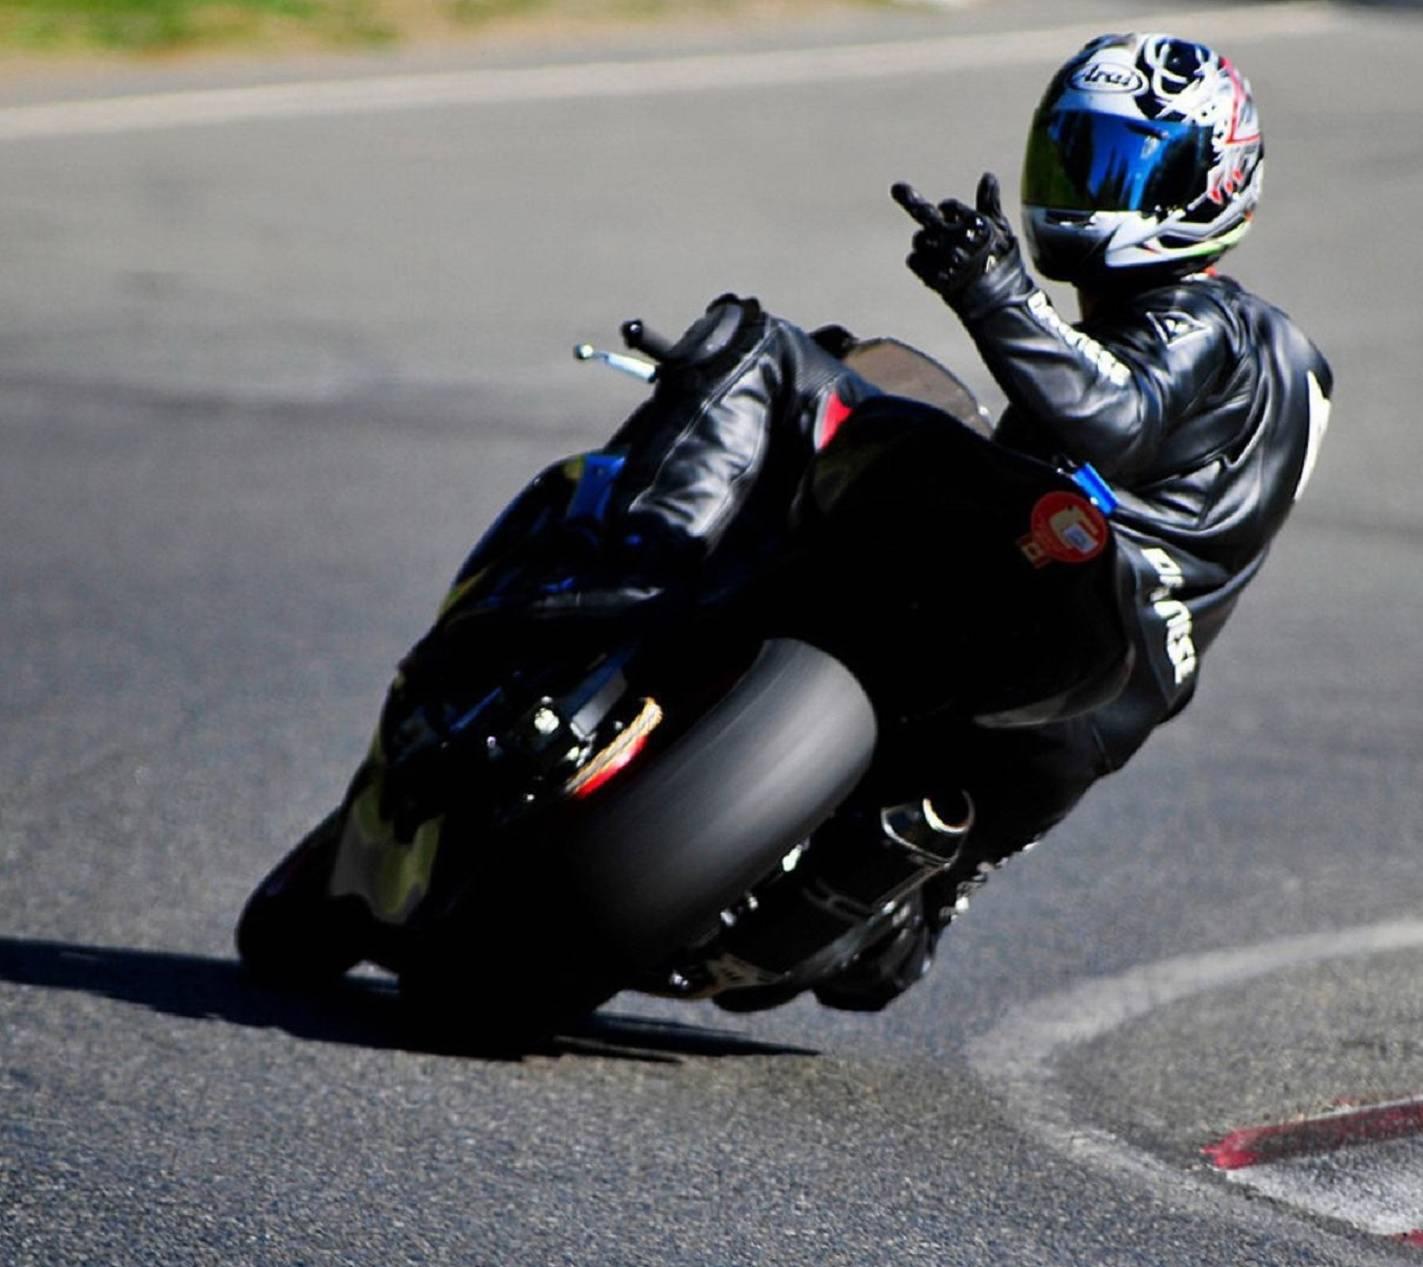 bikers wallpapermanojred - 7c - free on zedge™